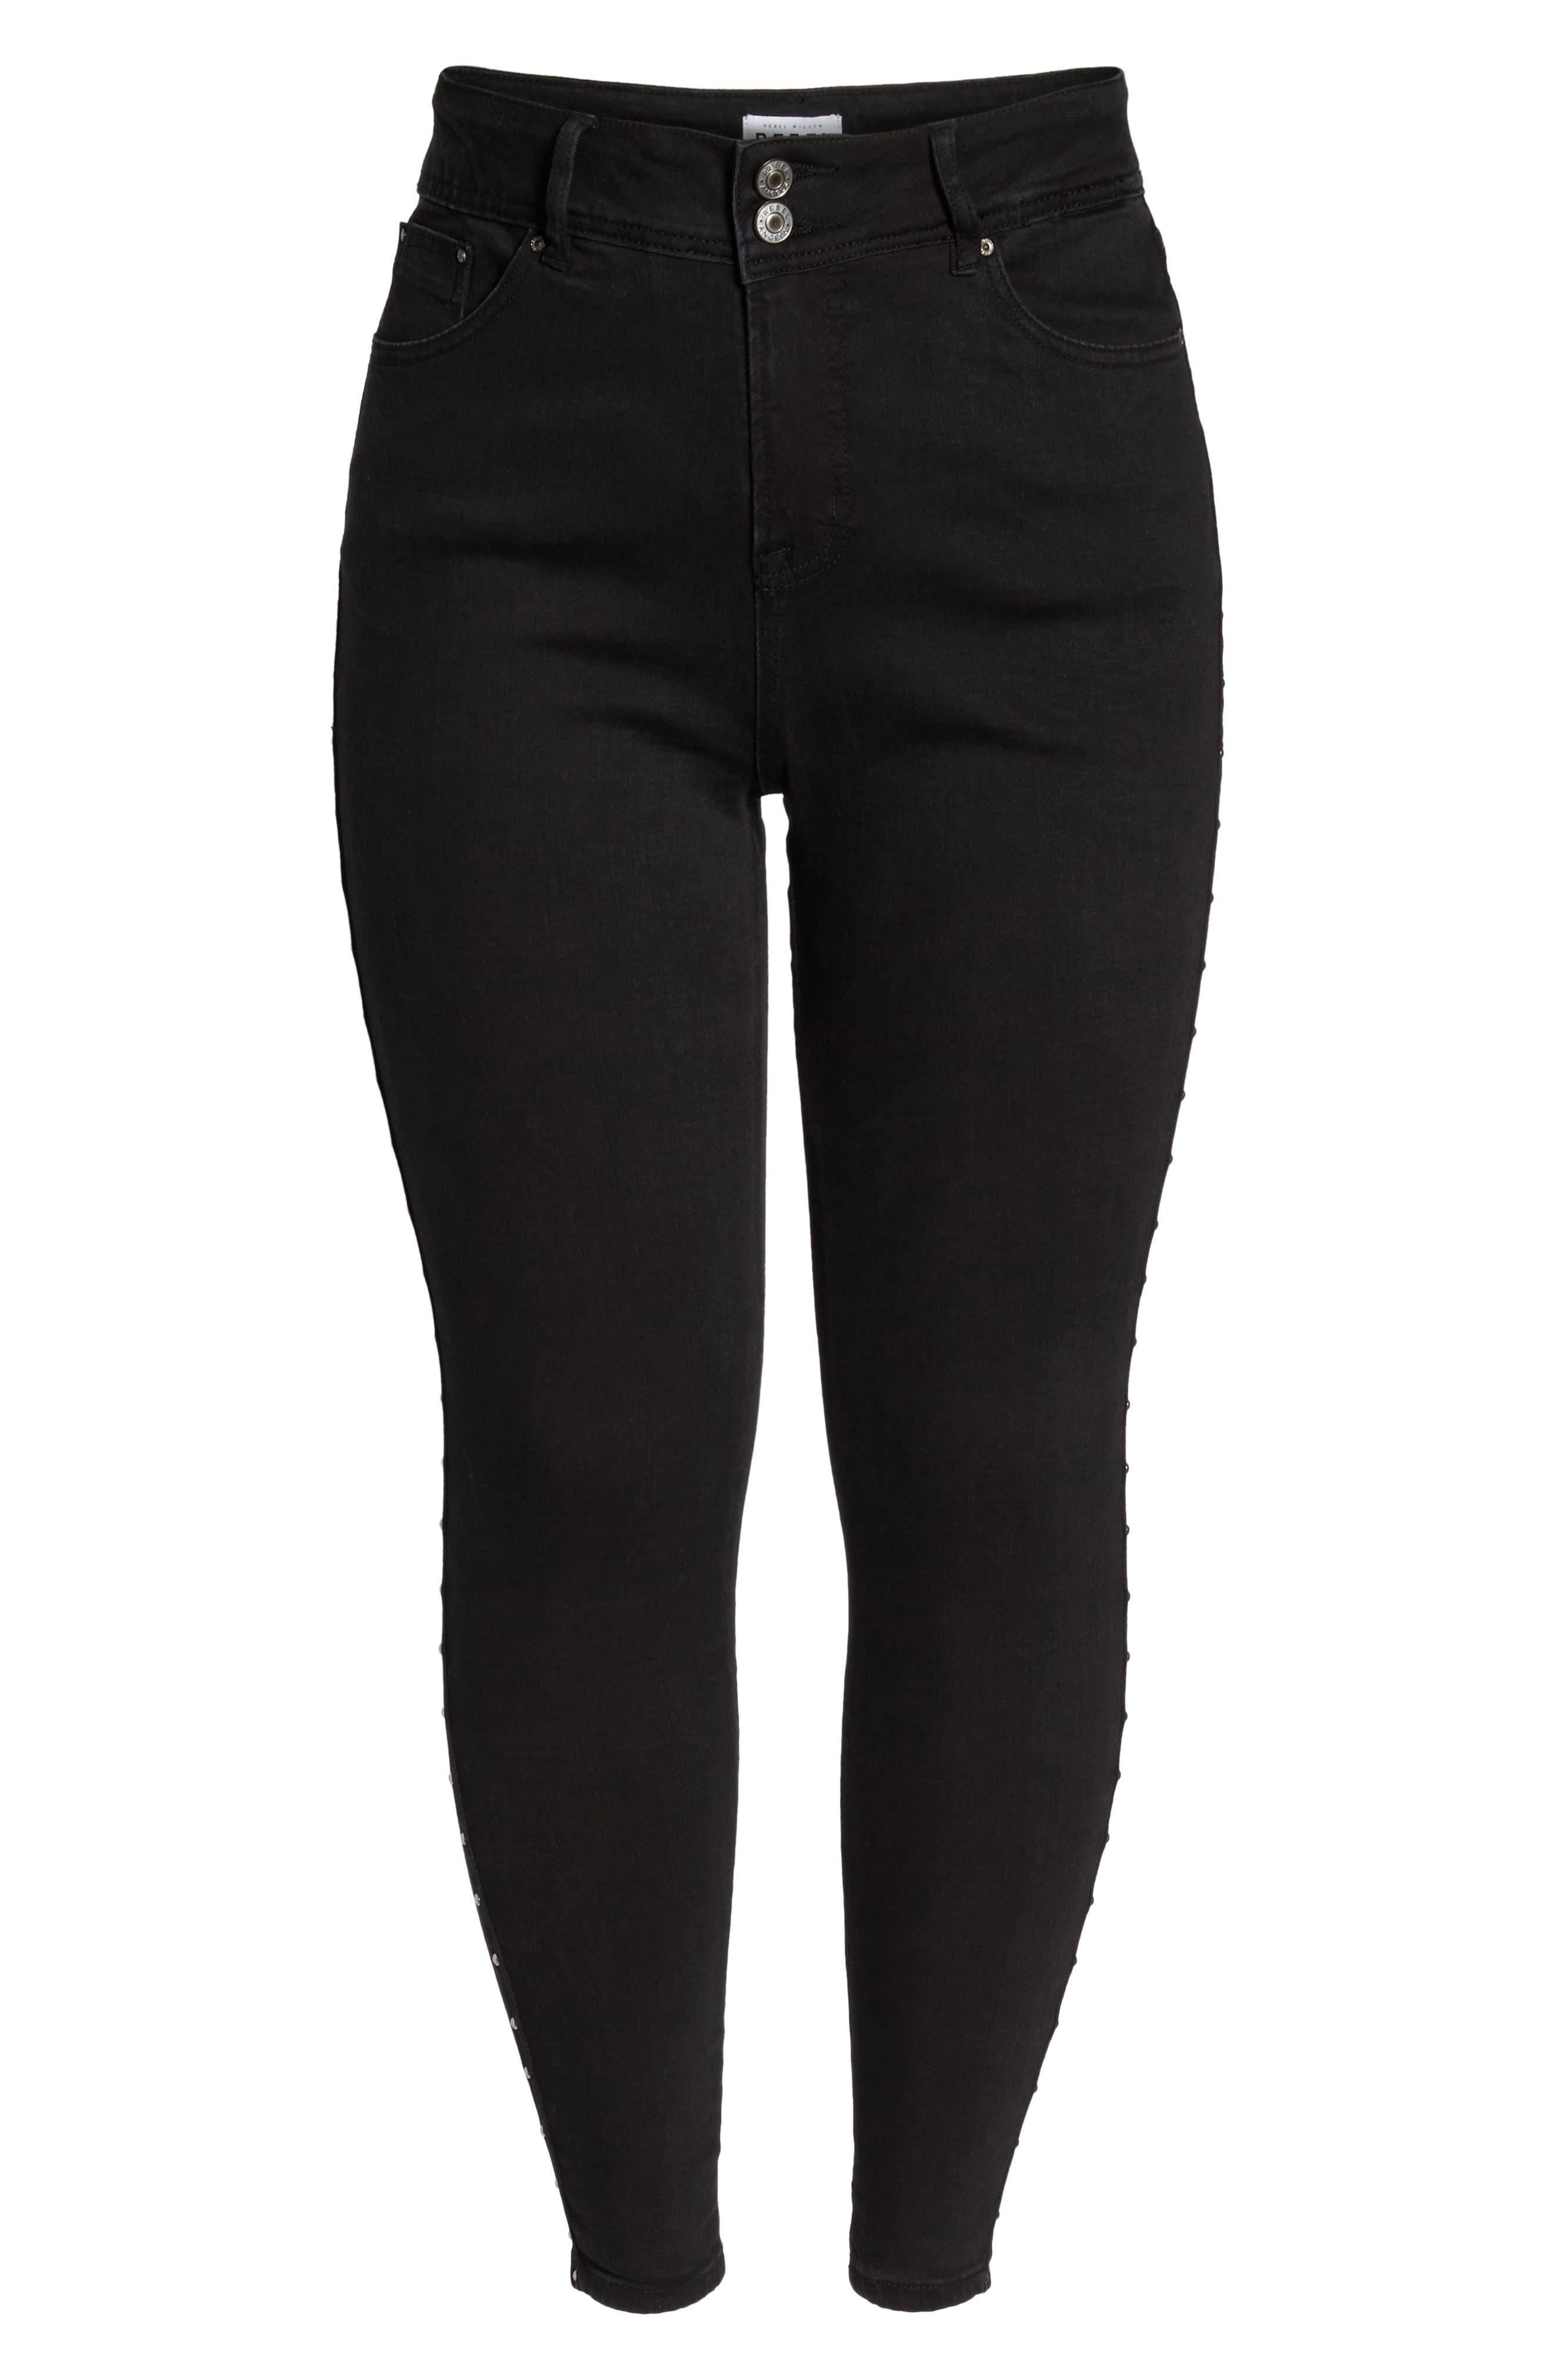 Alternate Image 4  - Rebel Wilson x Angels Studded High Waist Skinny Jeans (Plus Size)